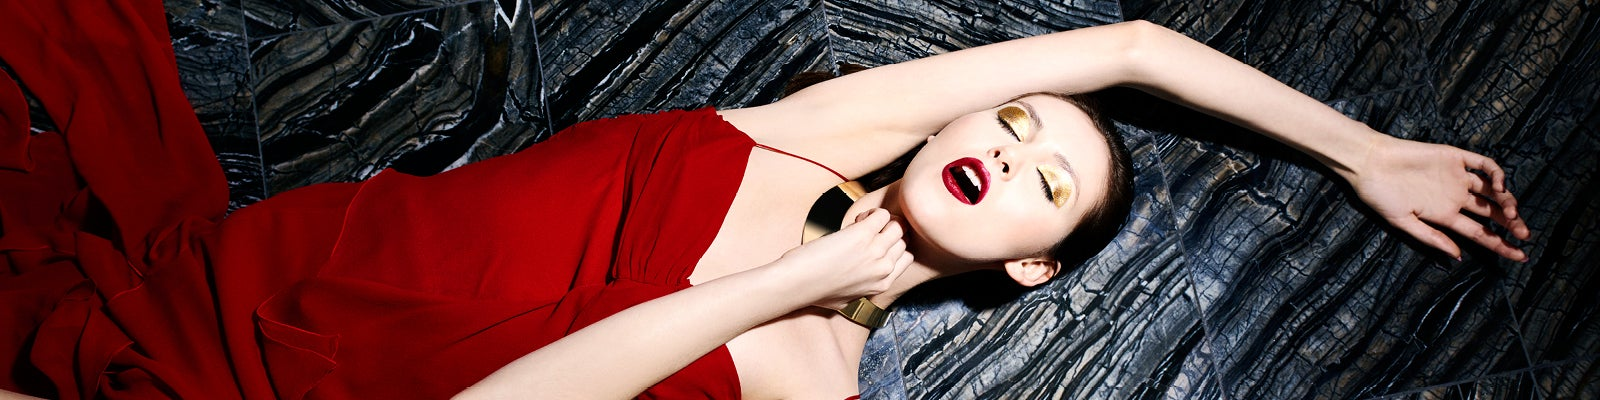 Shrimpton Couture background